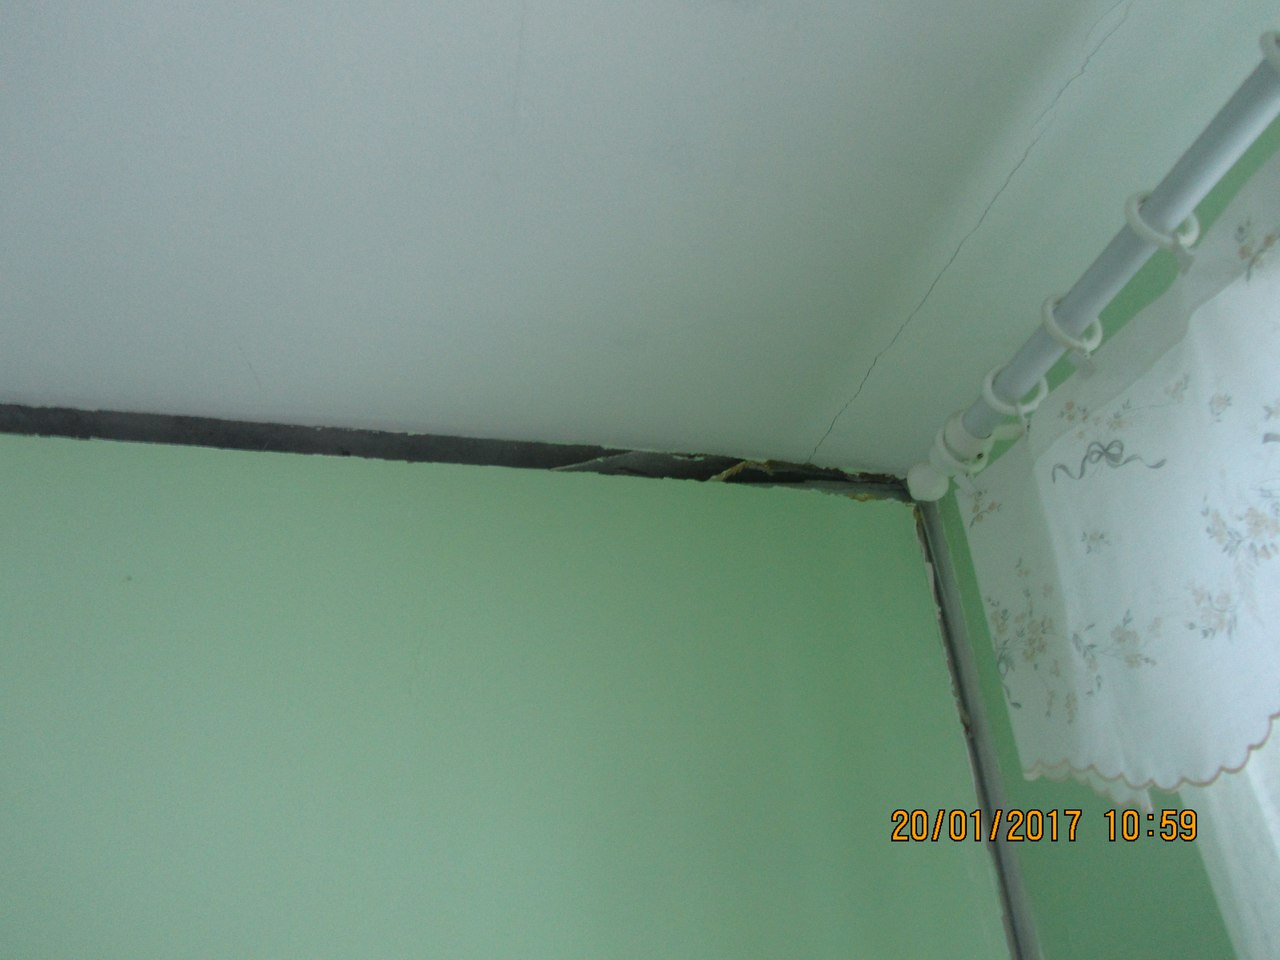 Стена между комнатами. Фото: Светлана Король